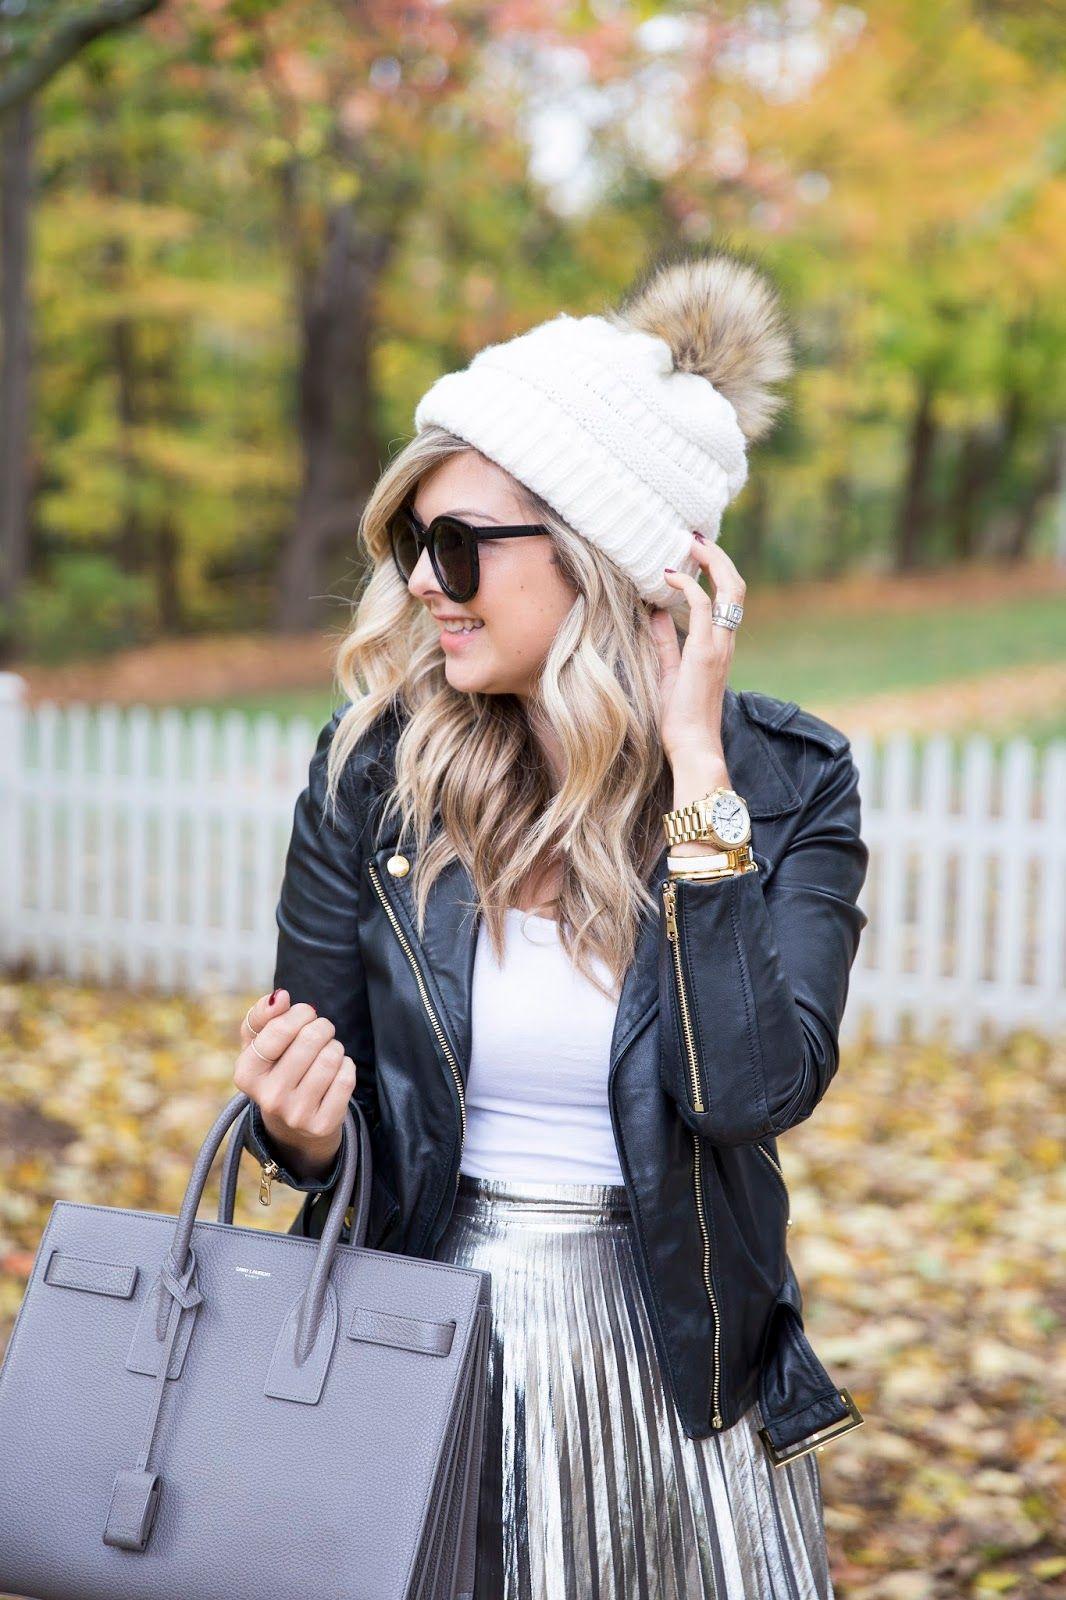 Torontobased fashion and lifestyle blogger Krystin writes about